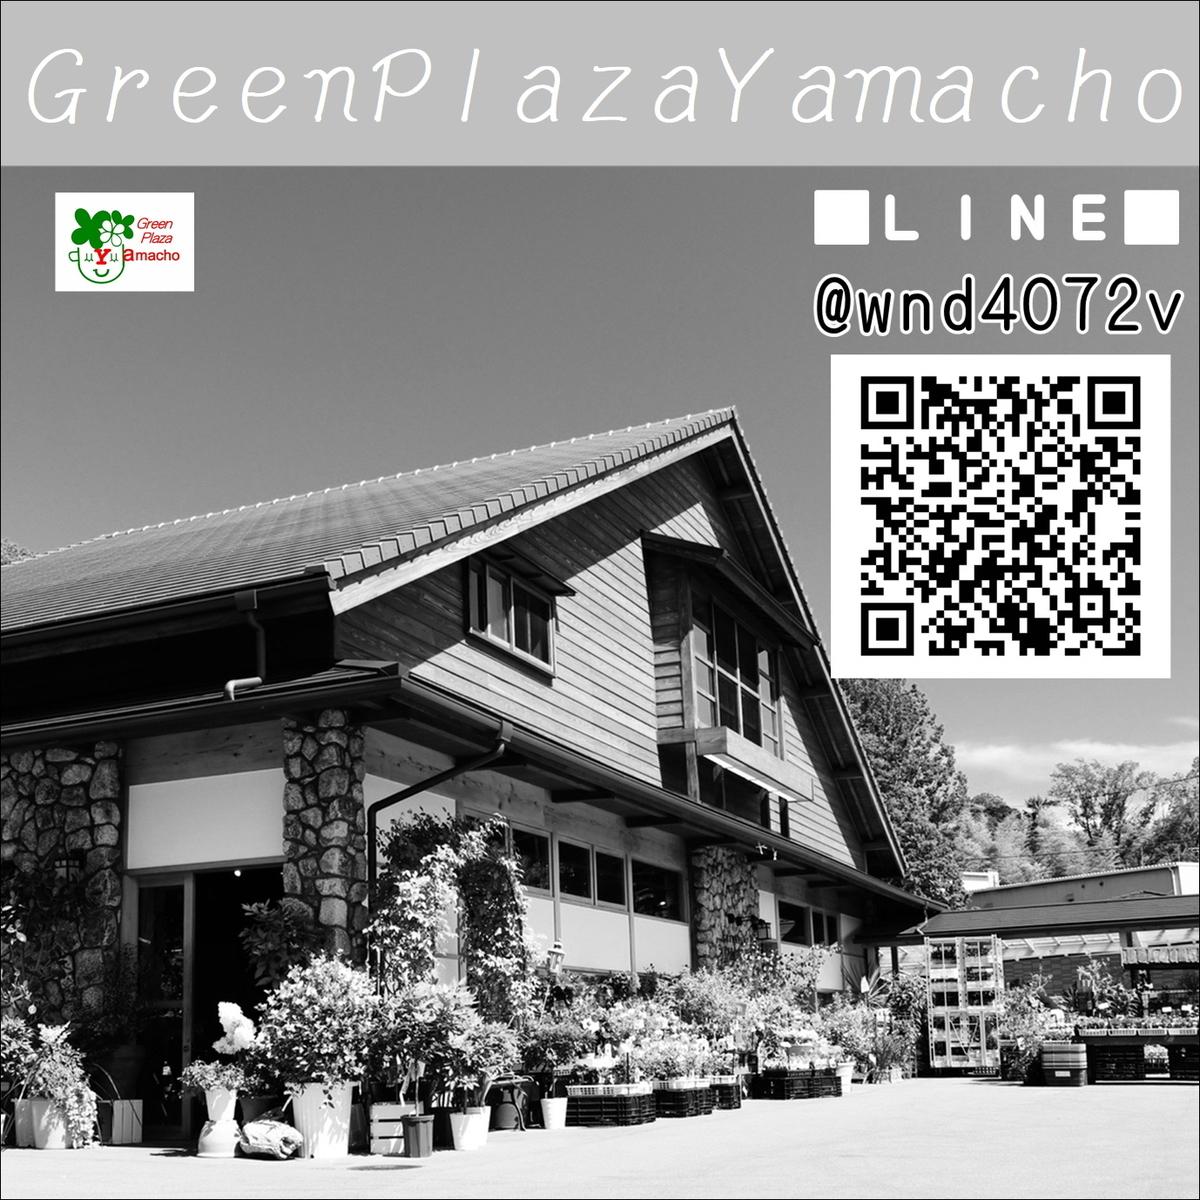 f:id:GP-Yamacho:20200220103703j:plain